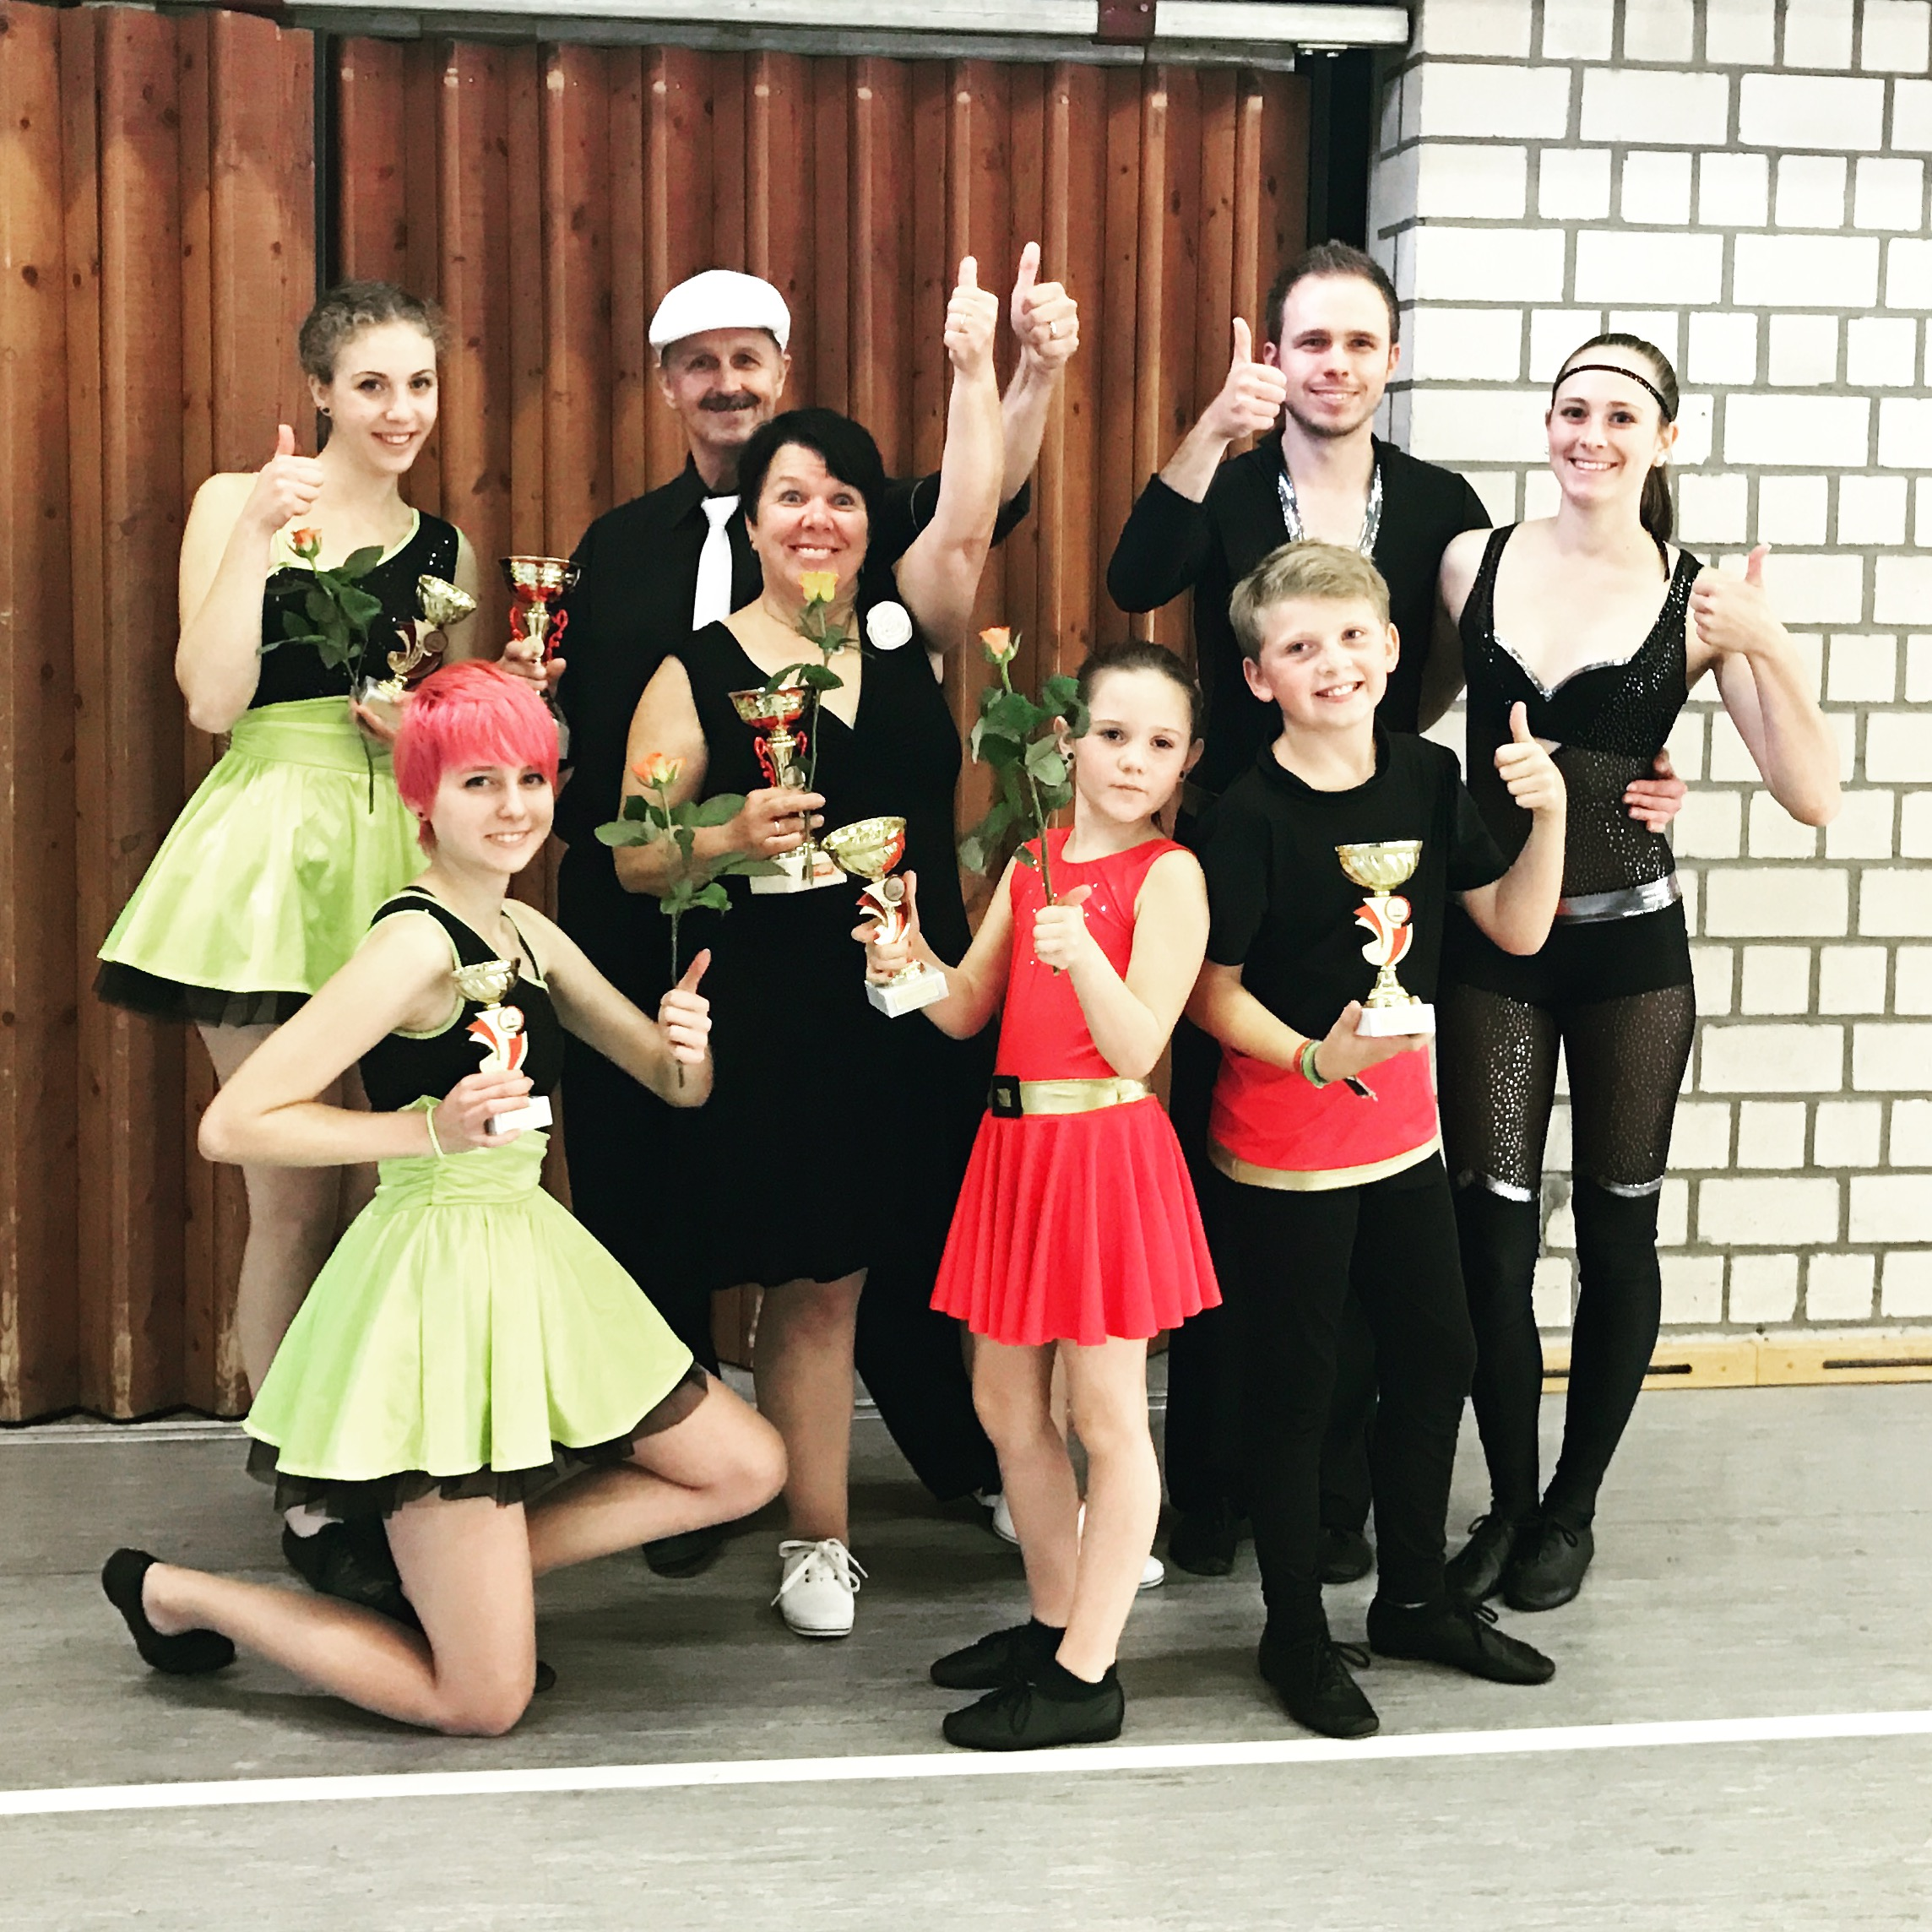 3 Tanzpaare – 3 Pokale!